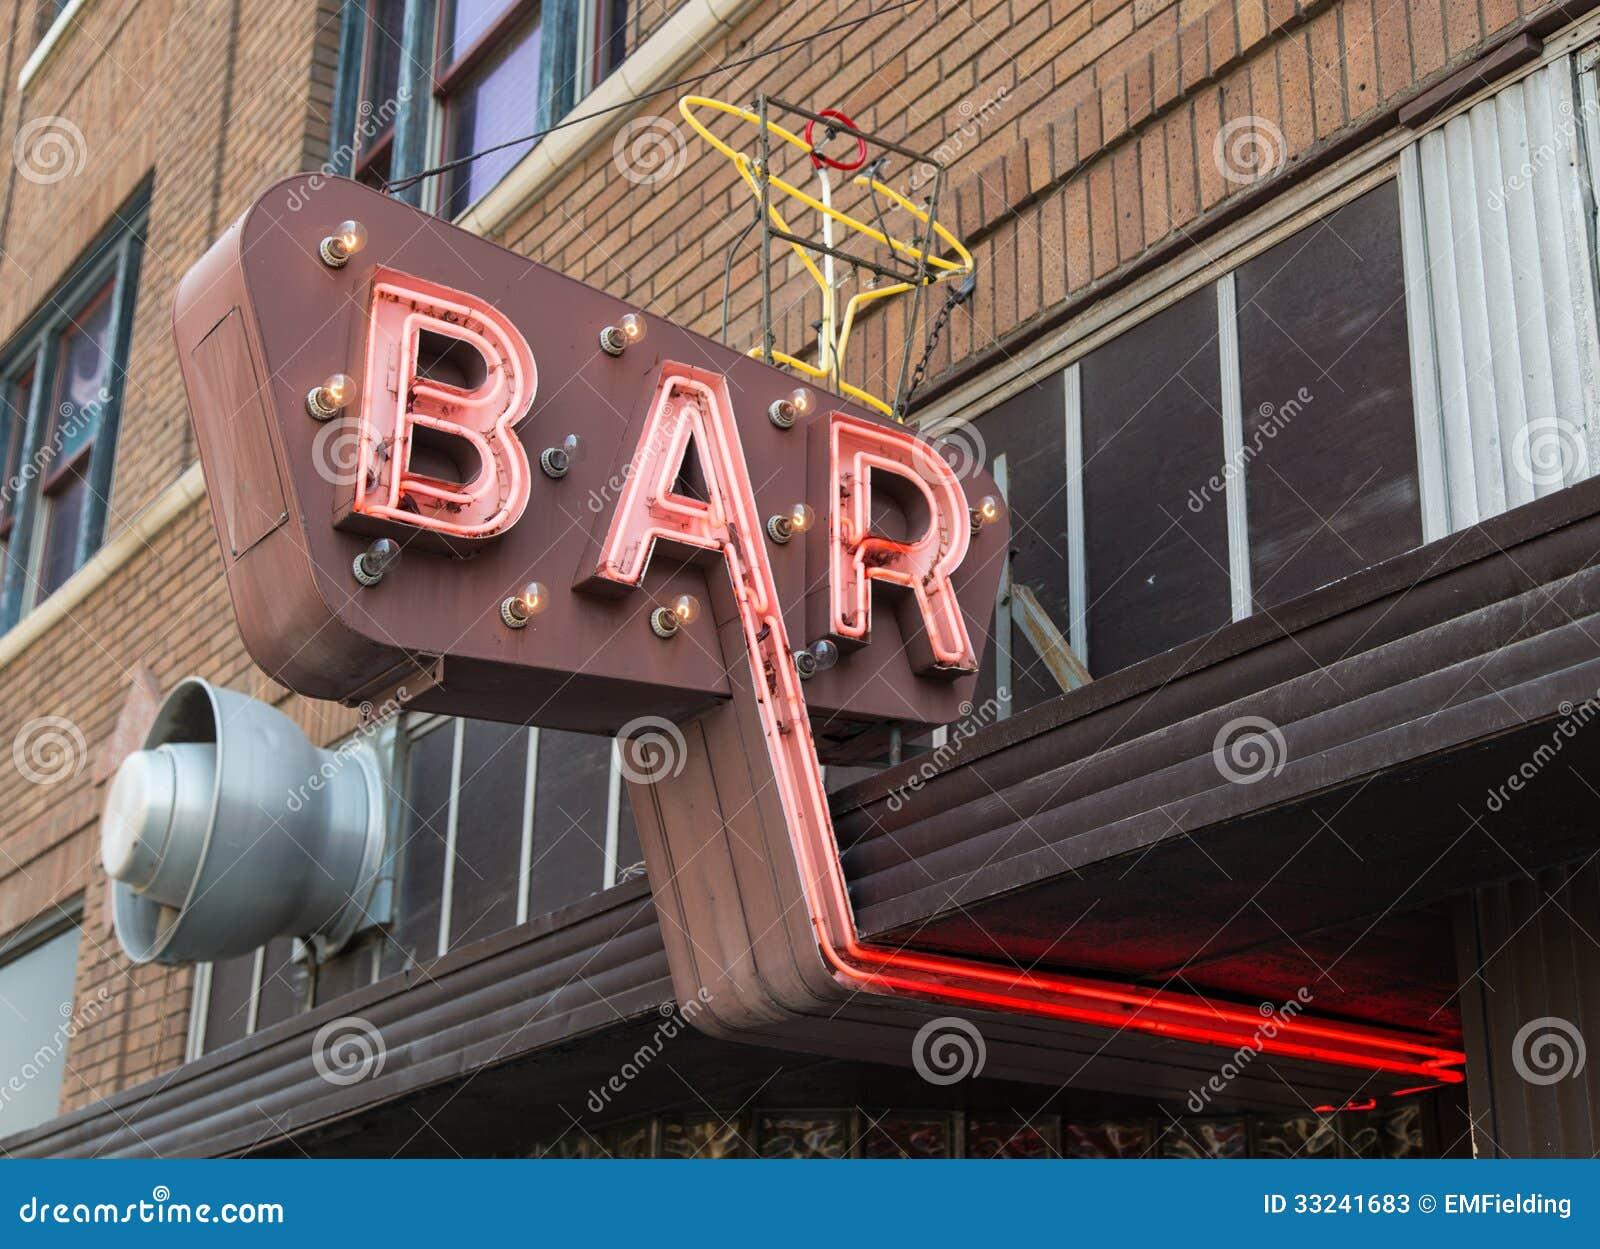 Vintage Neon Bar Sign Stock Photos - Image: 33241683